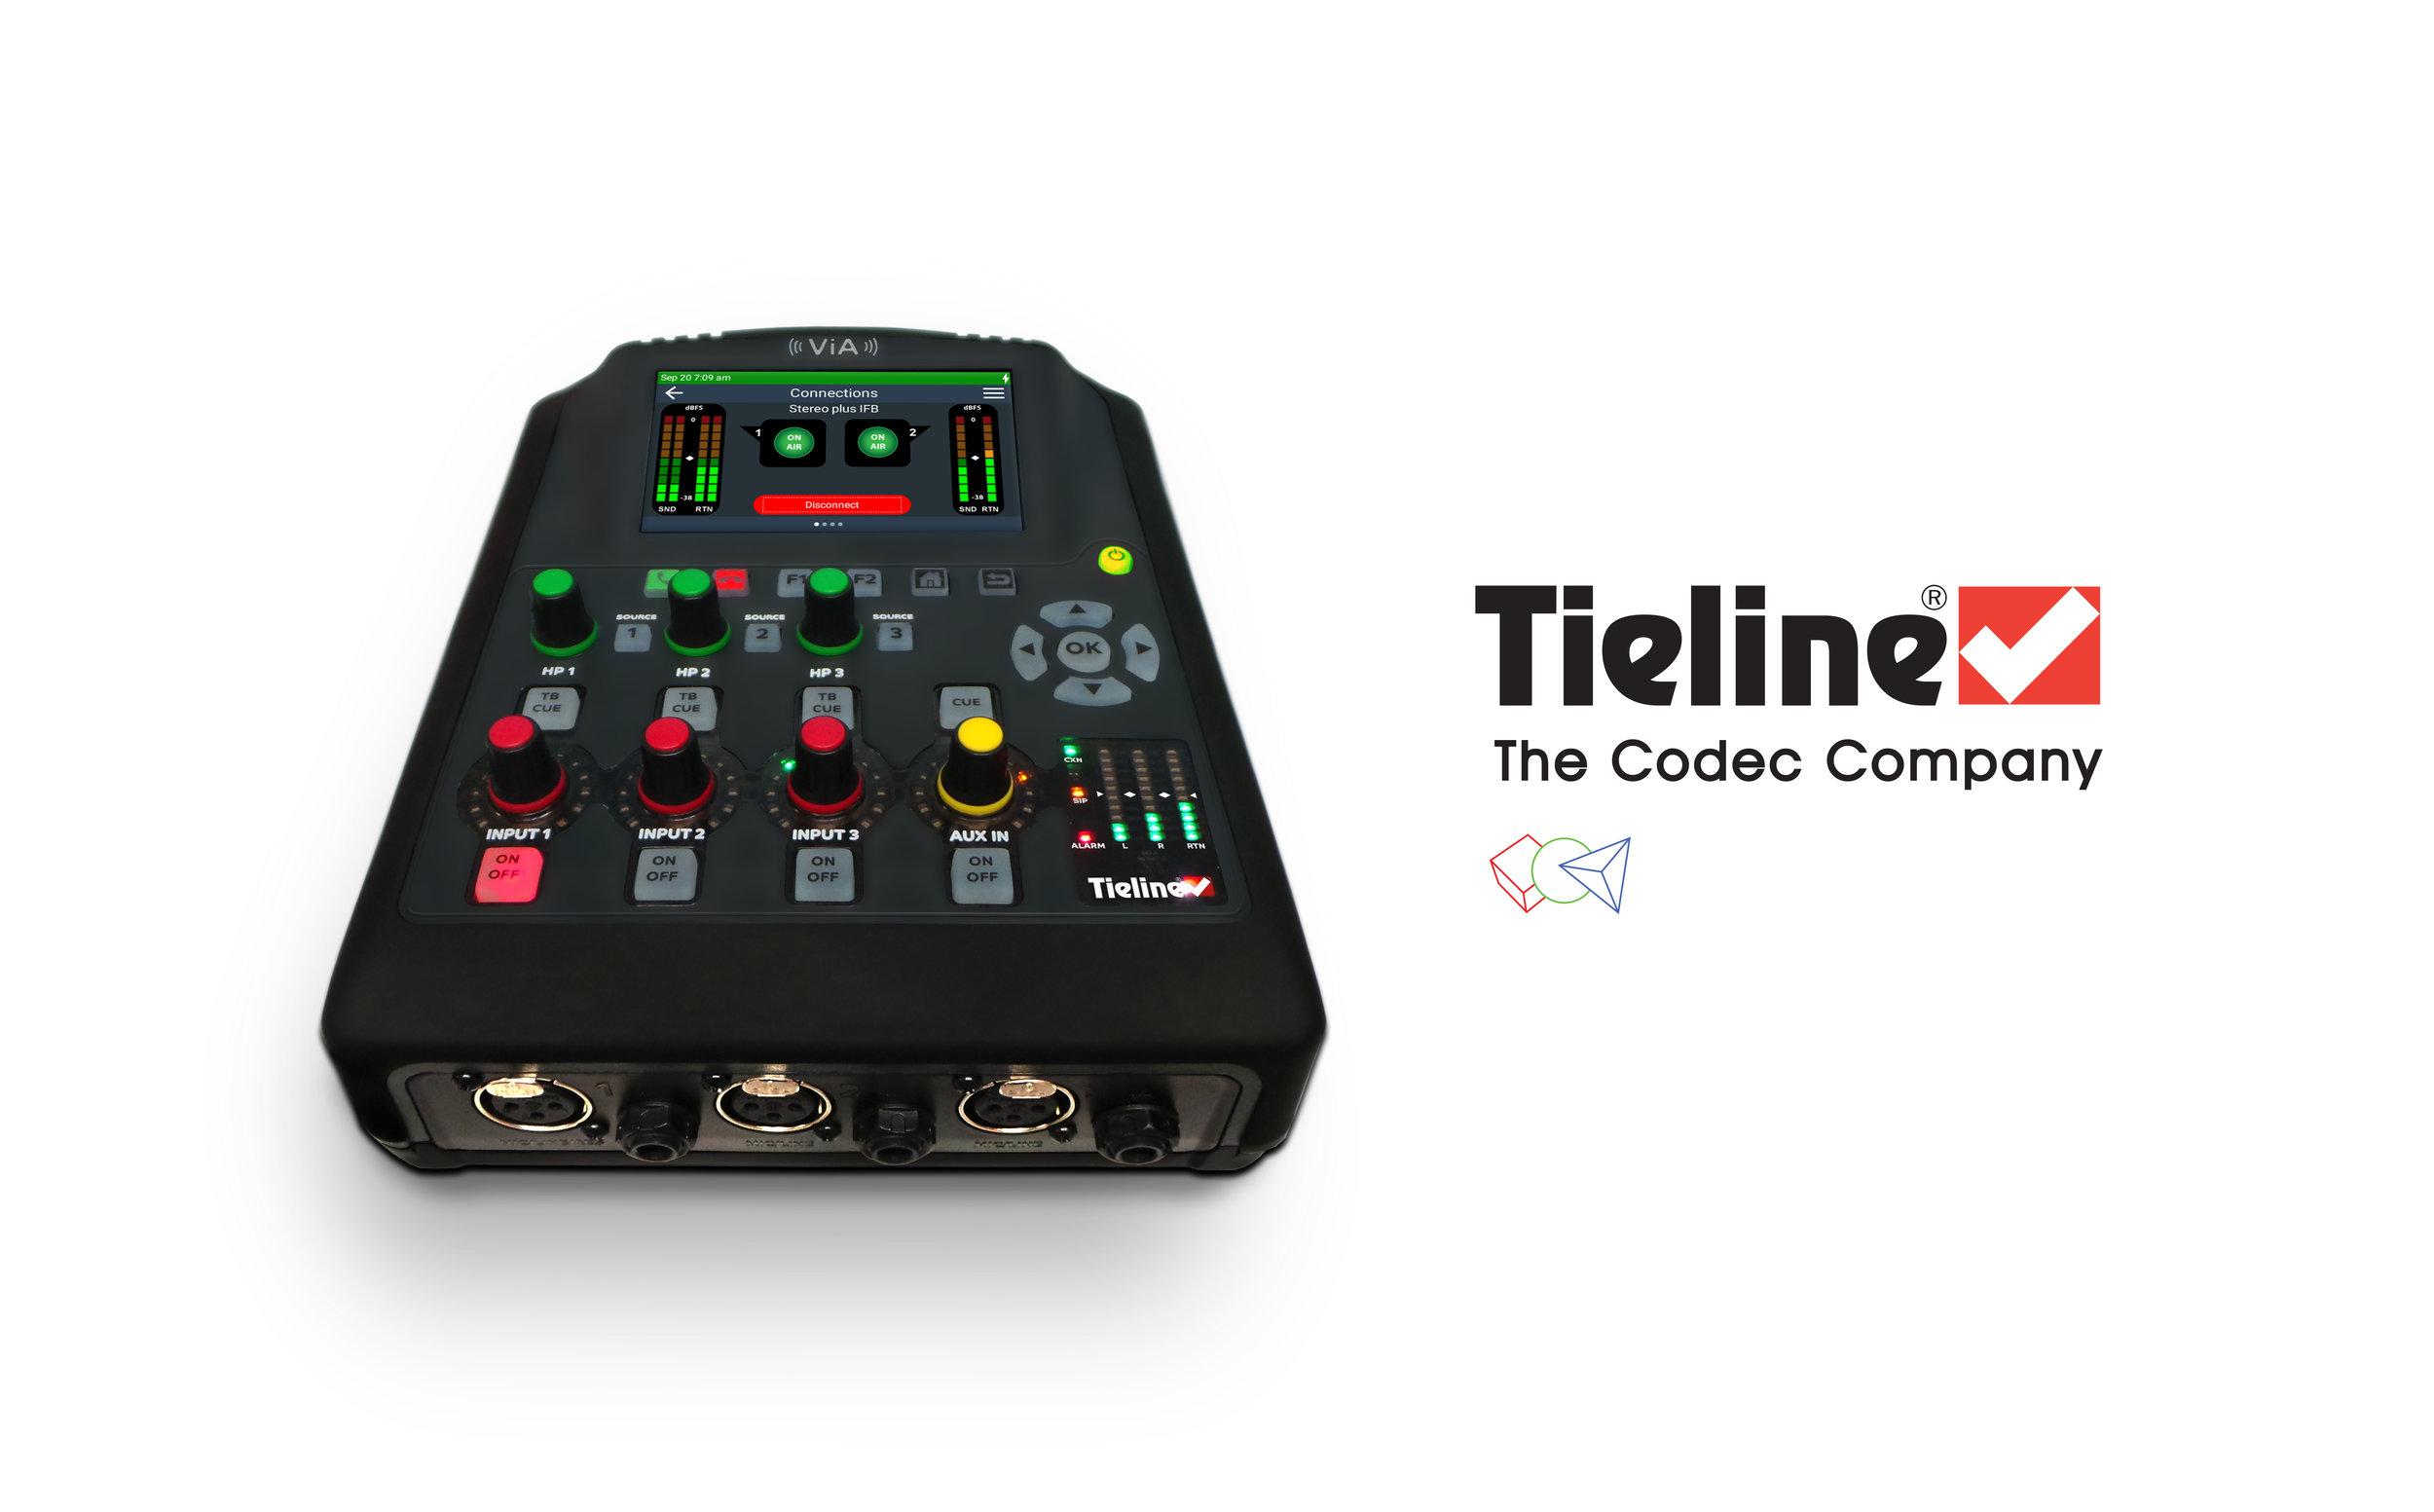 Tieline_2.jpg